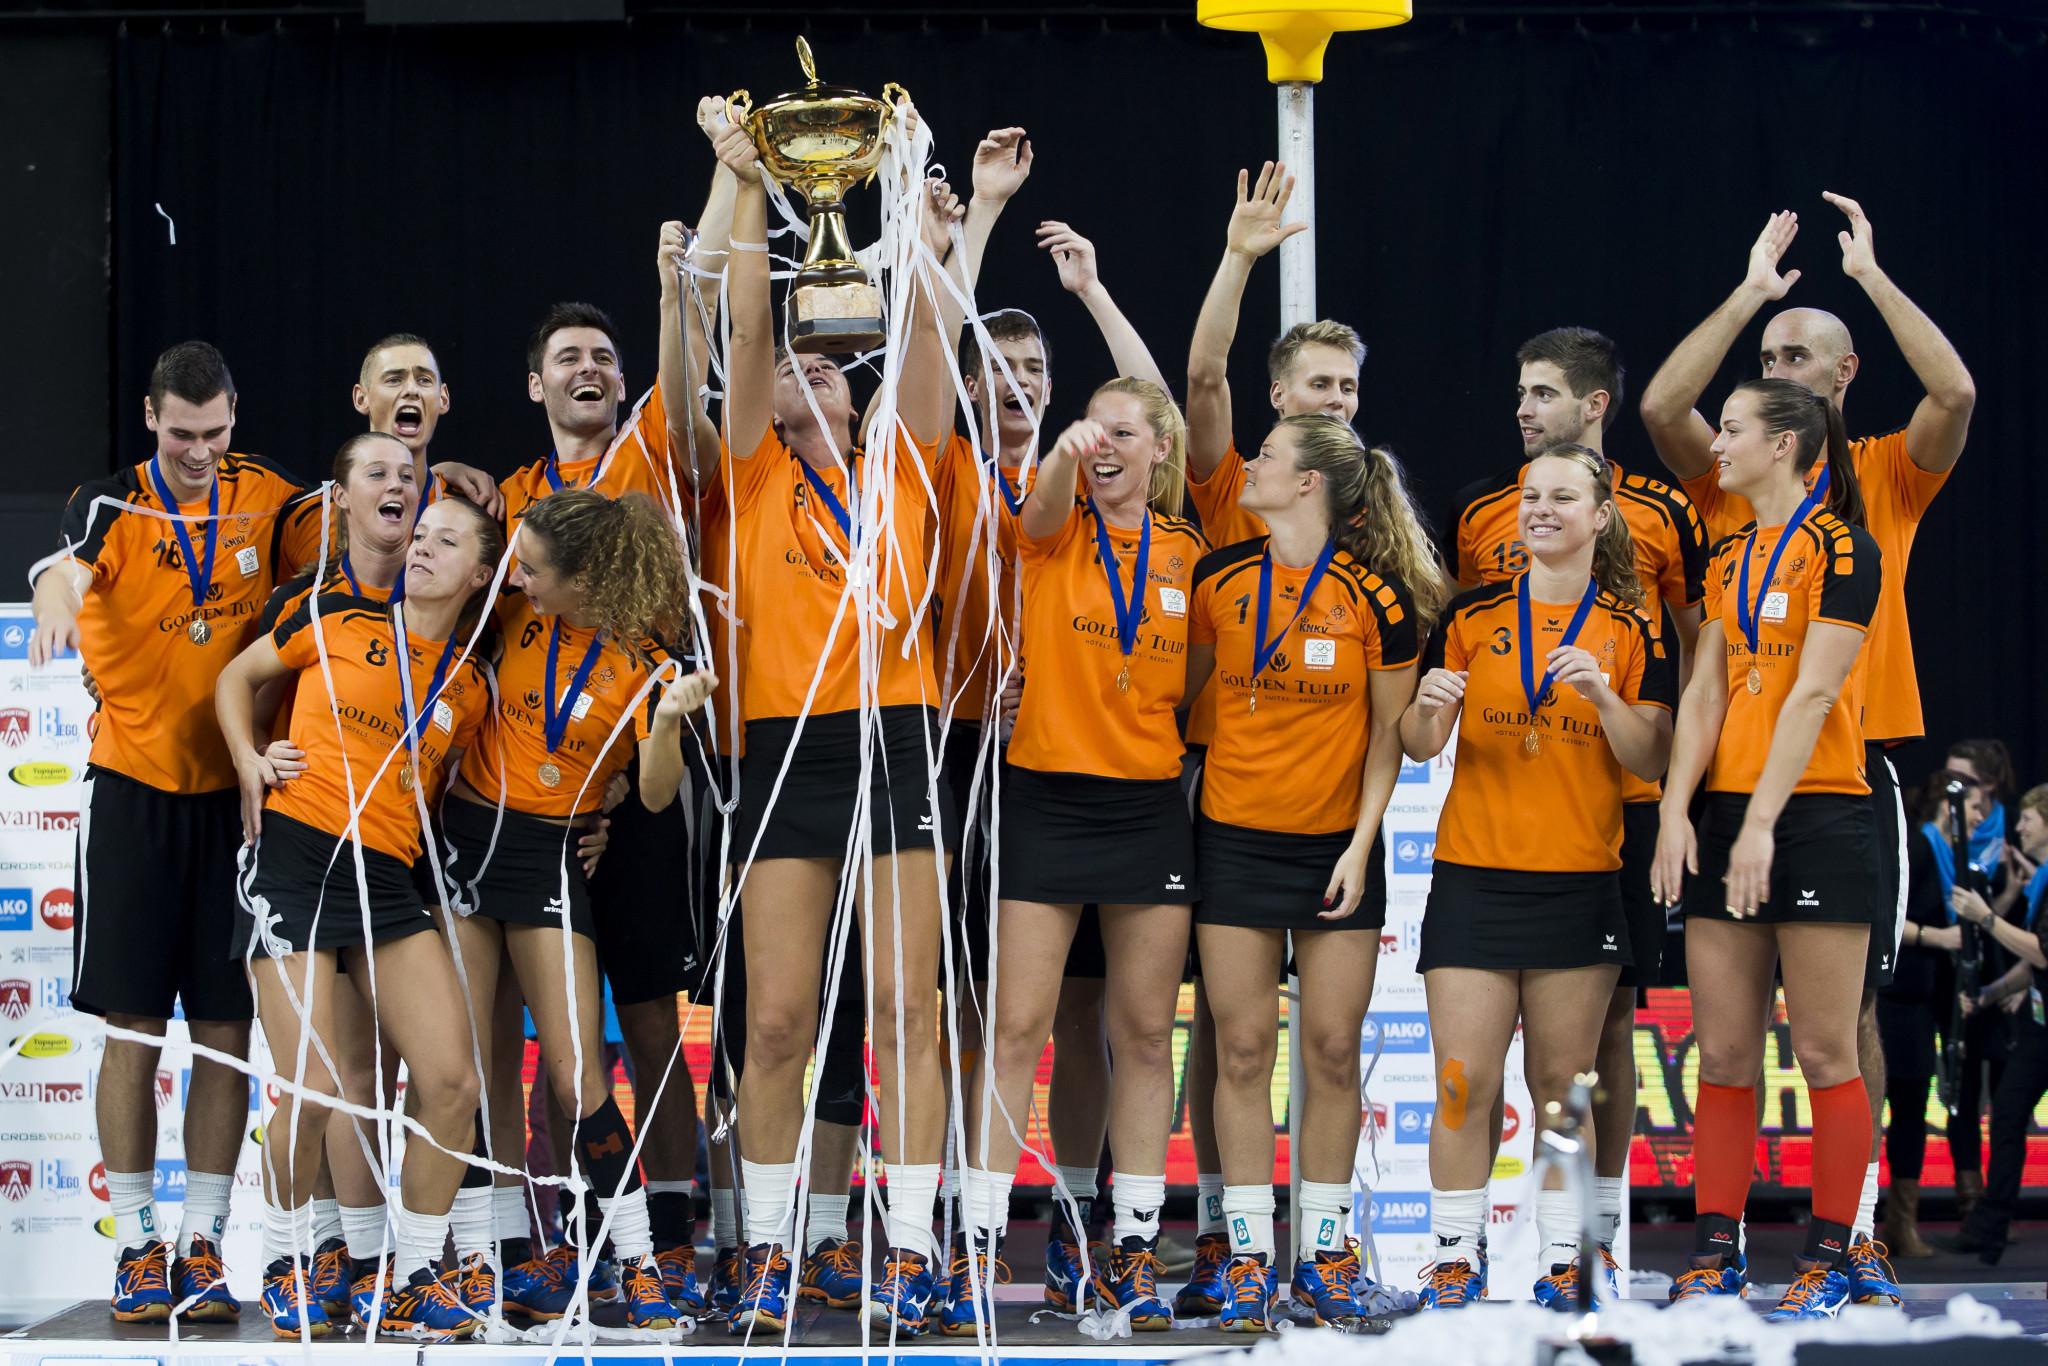 International Korfball Federation reveal format for 2019 World Championship